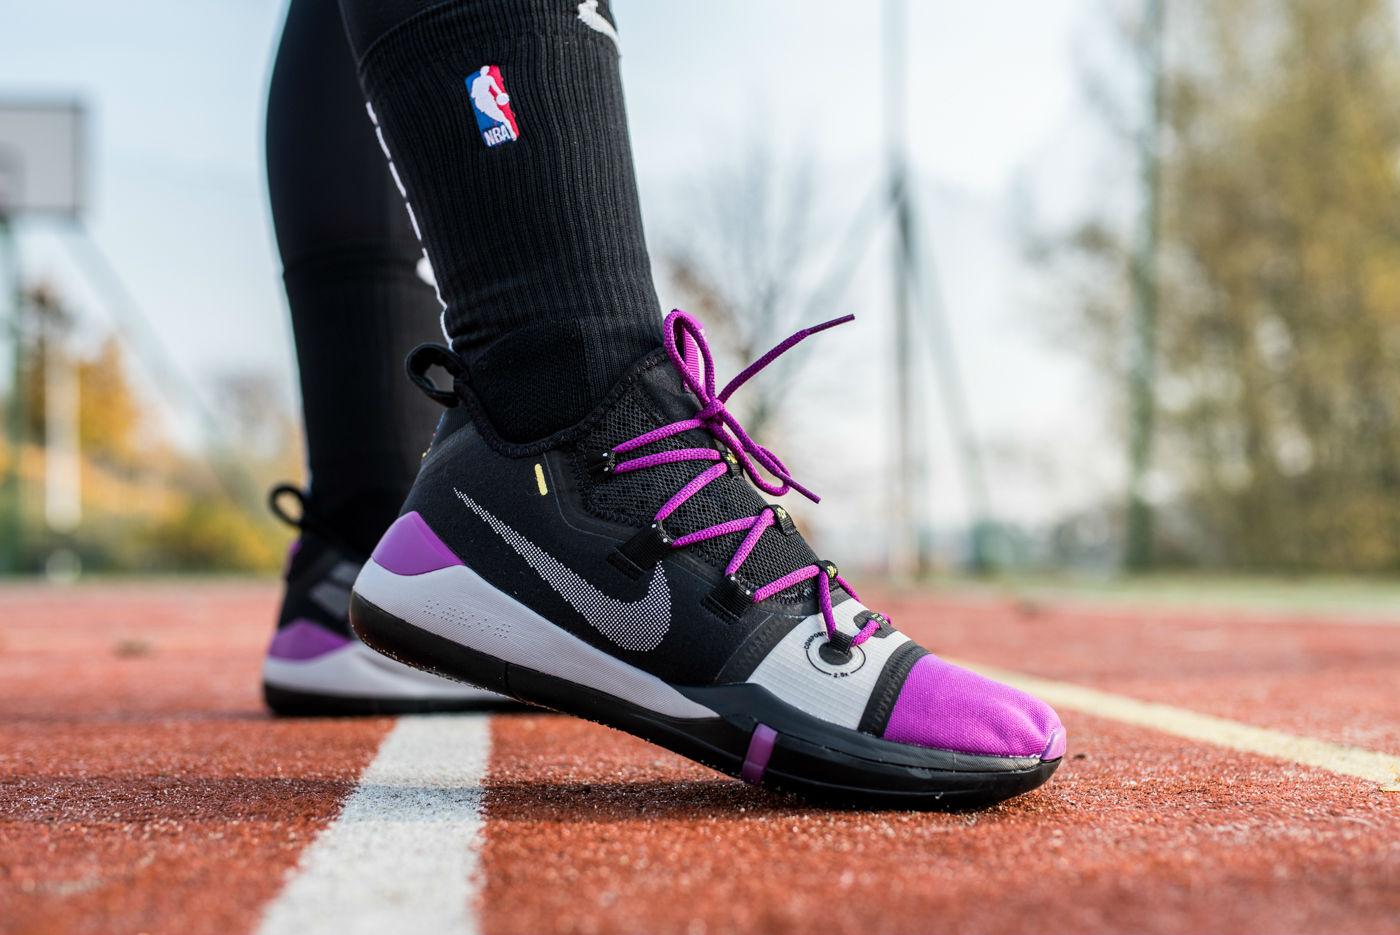 buy popular d86b2 df119 Available Now: Nike Kobe AD Black Purple • KicksOnFire.com